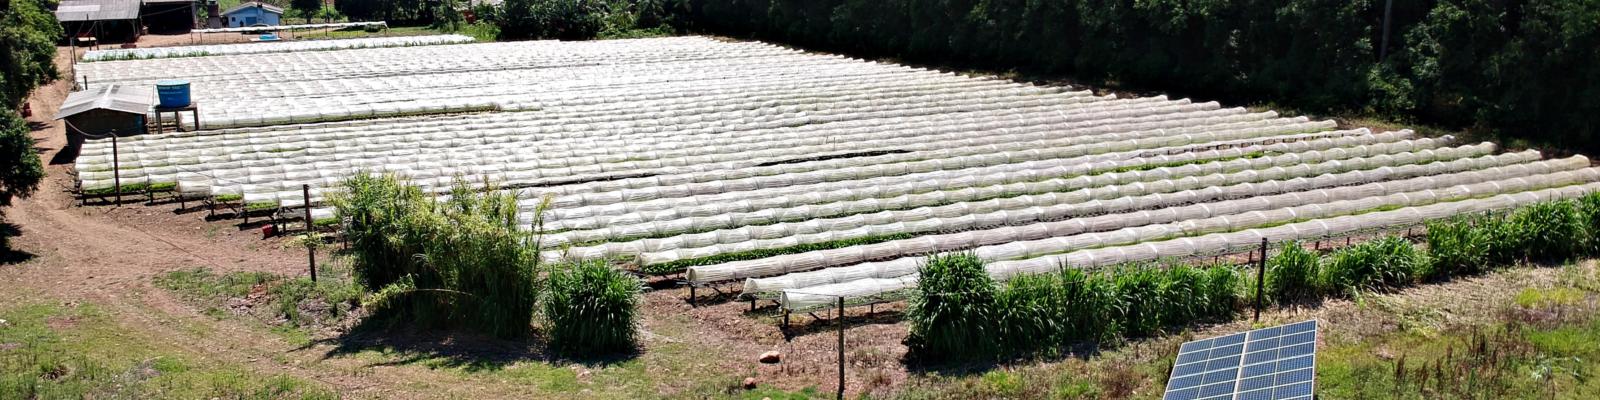 Energia solar na agricultura - Elysia sistema fotovoltaico Rio Grande do Sul